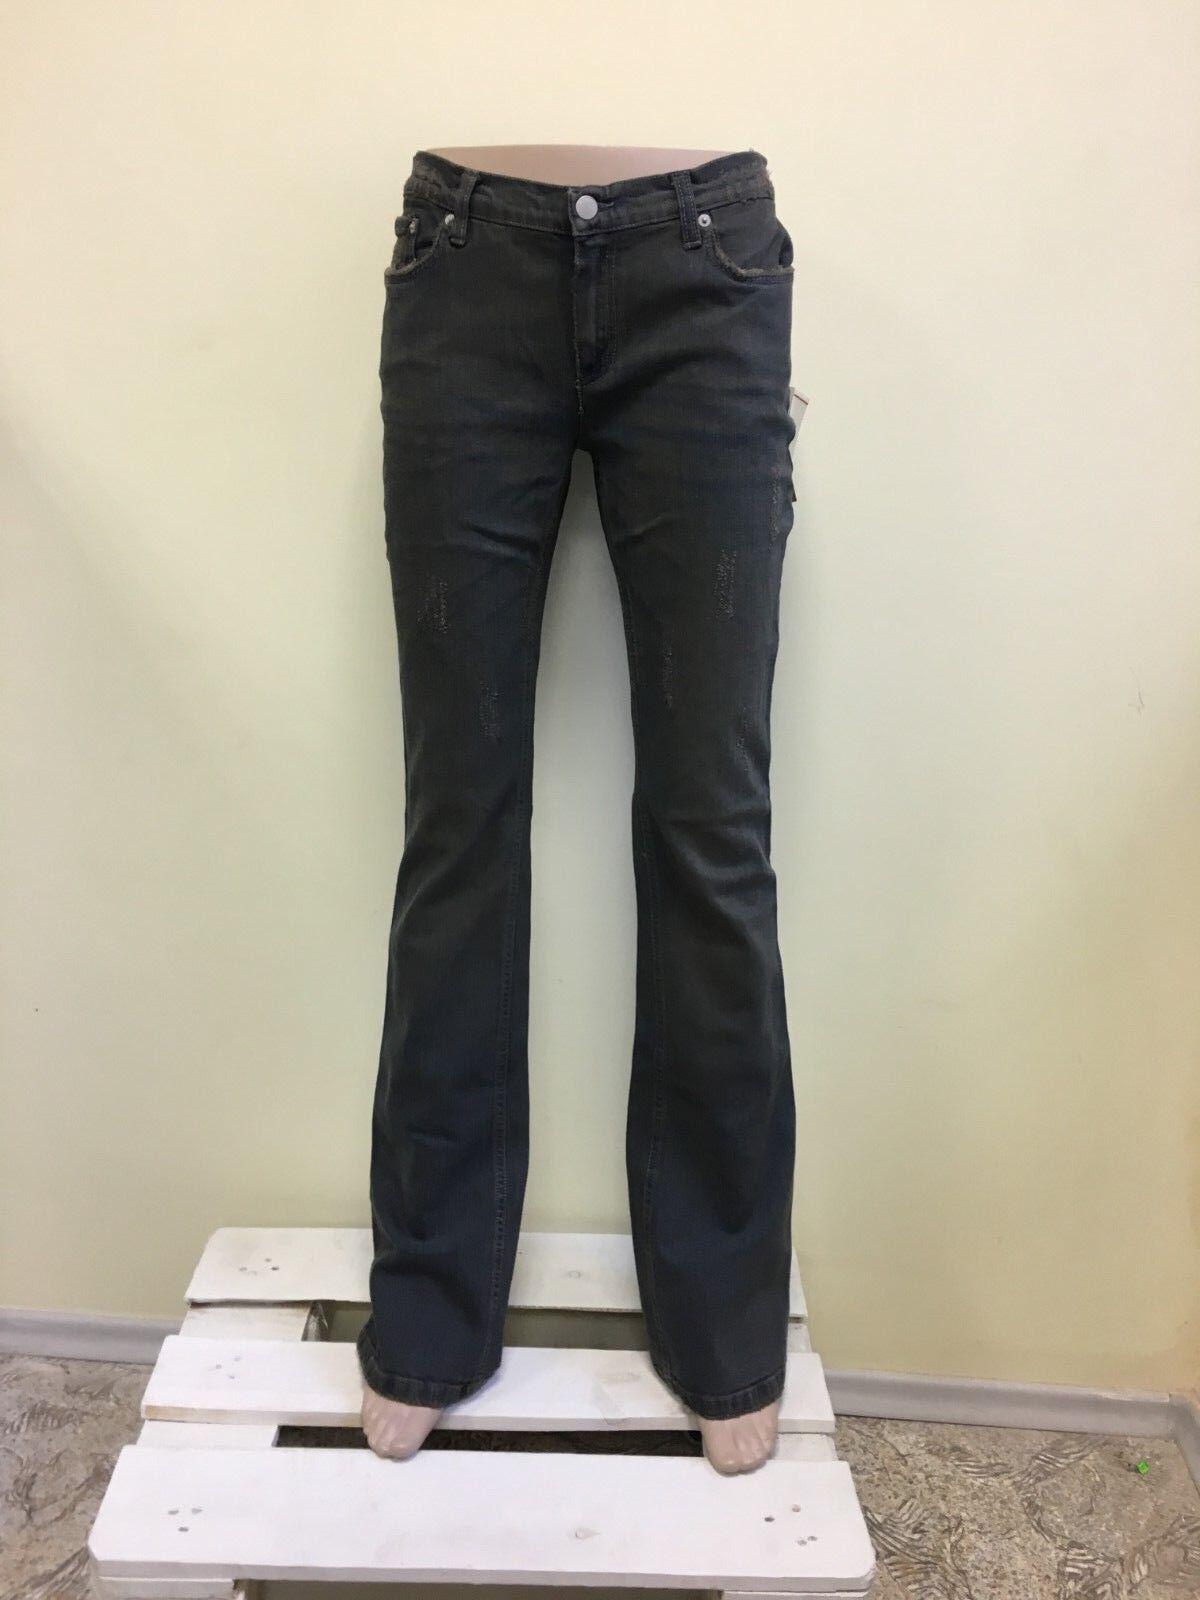 RICHMOND women's dark grey jeans BOOTCUT NWD